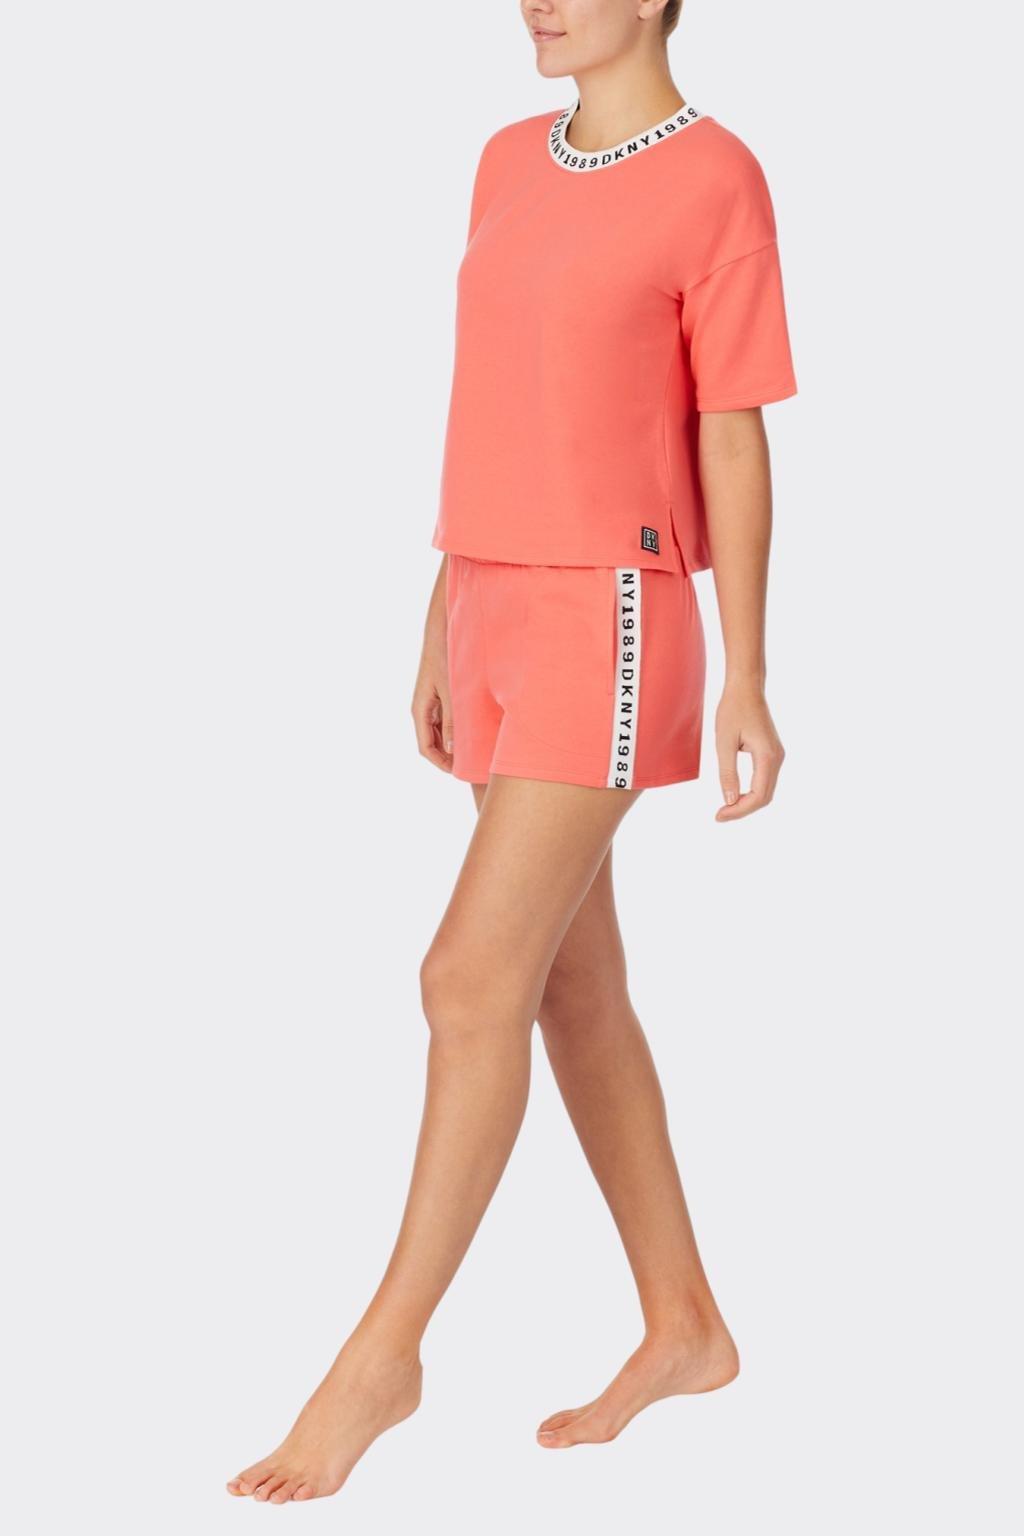 DKNY dámské pyžamo - oranžové